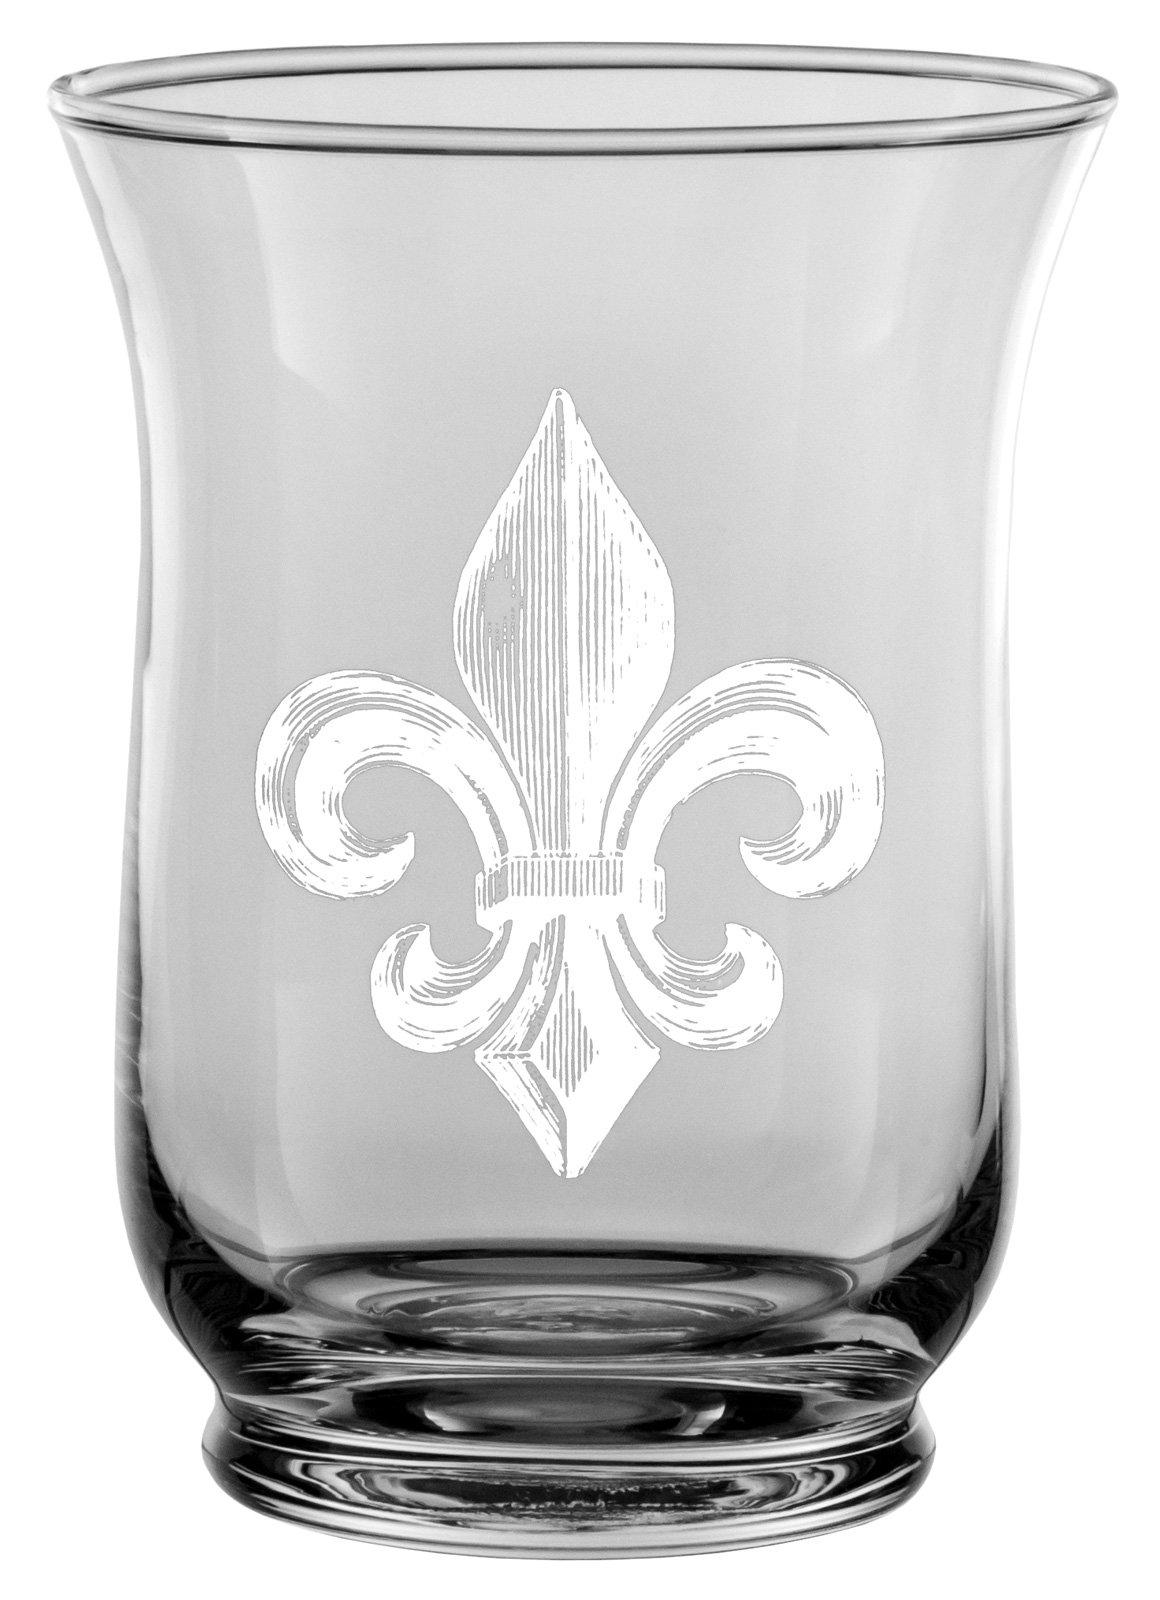 Small Glass Hurricane Candle Shade w/ White Fleur de Lis Decal, Set of 2 - 6''H